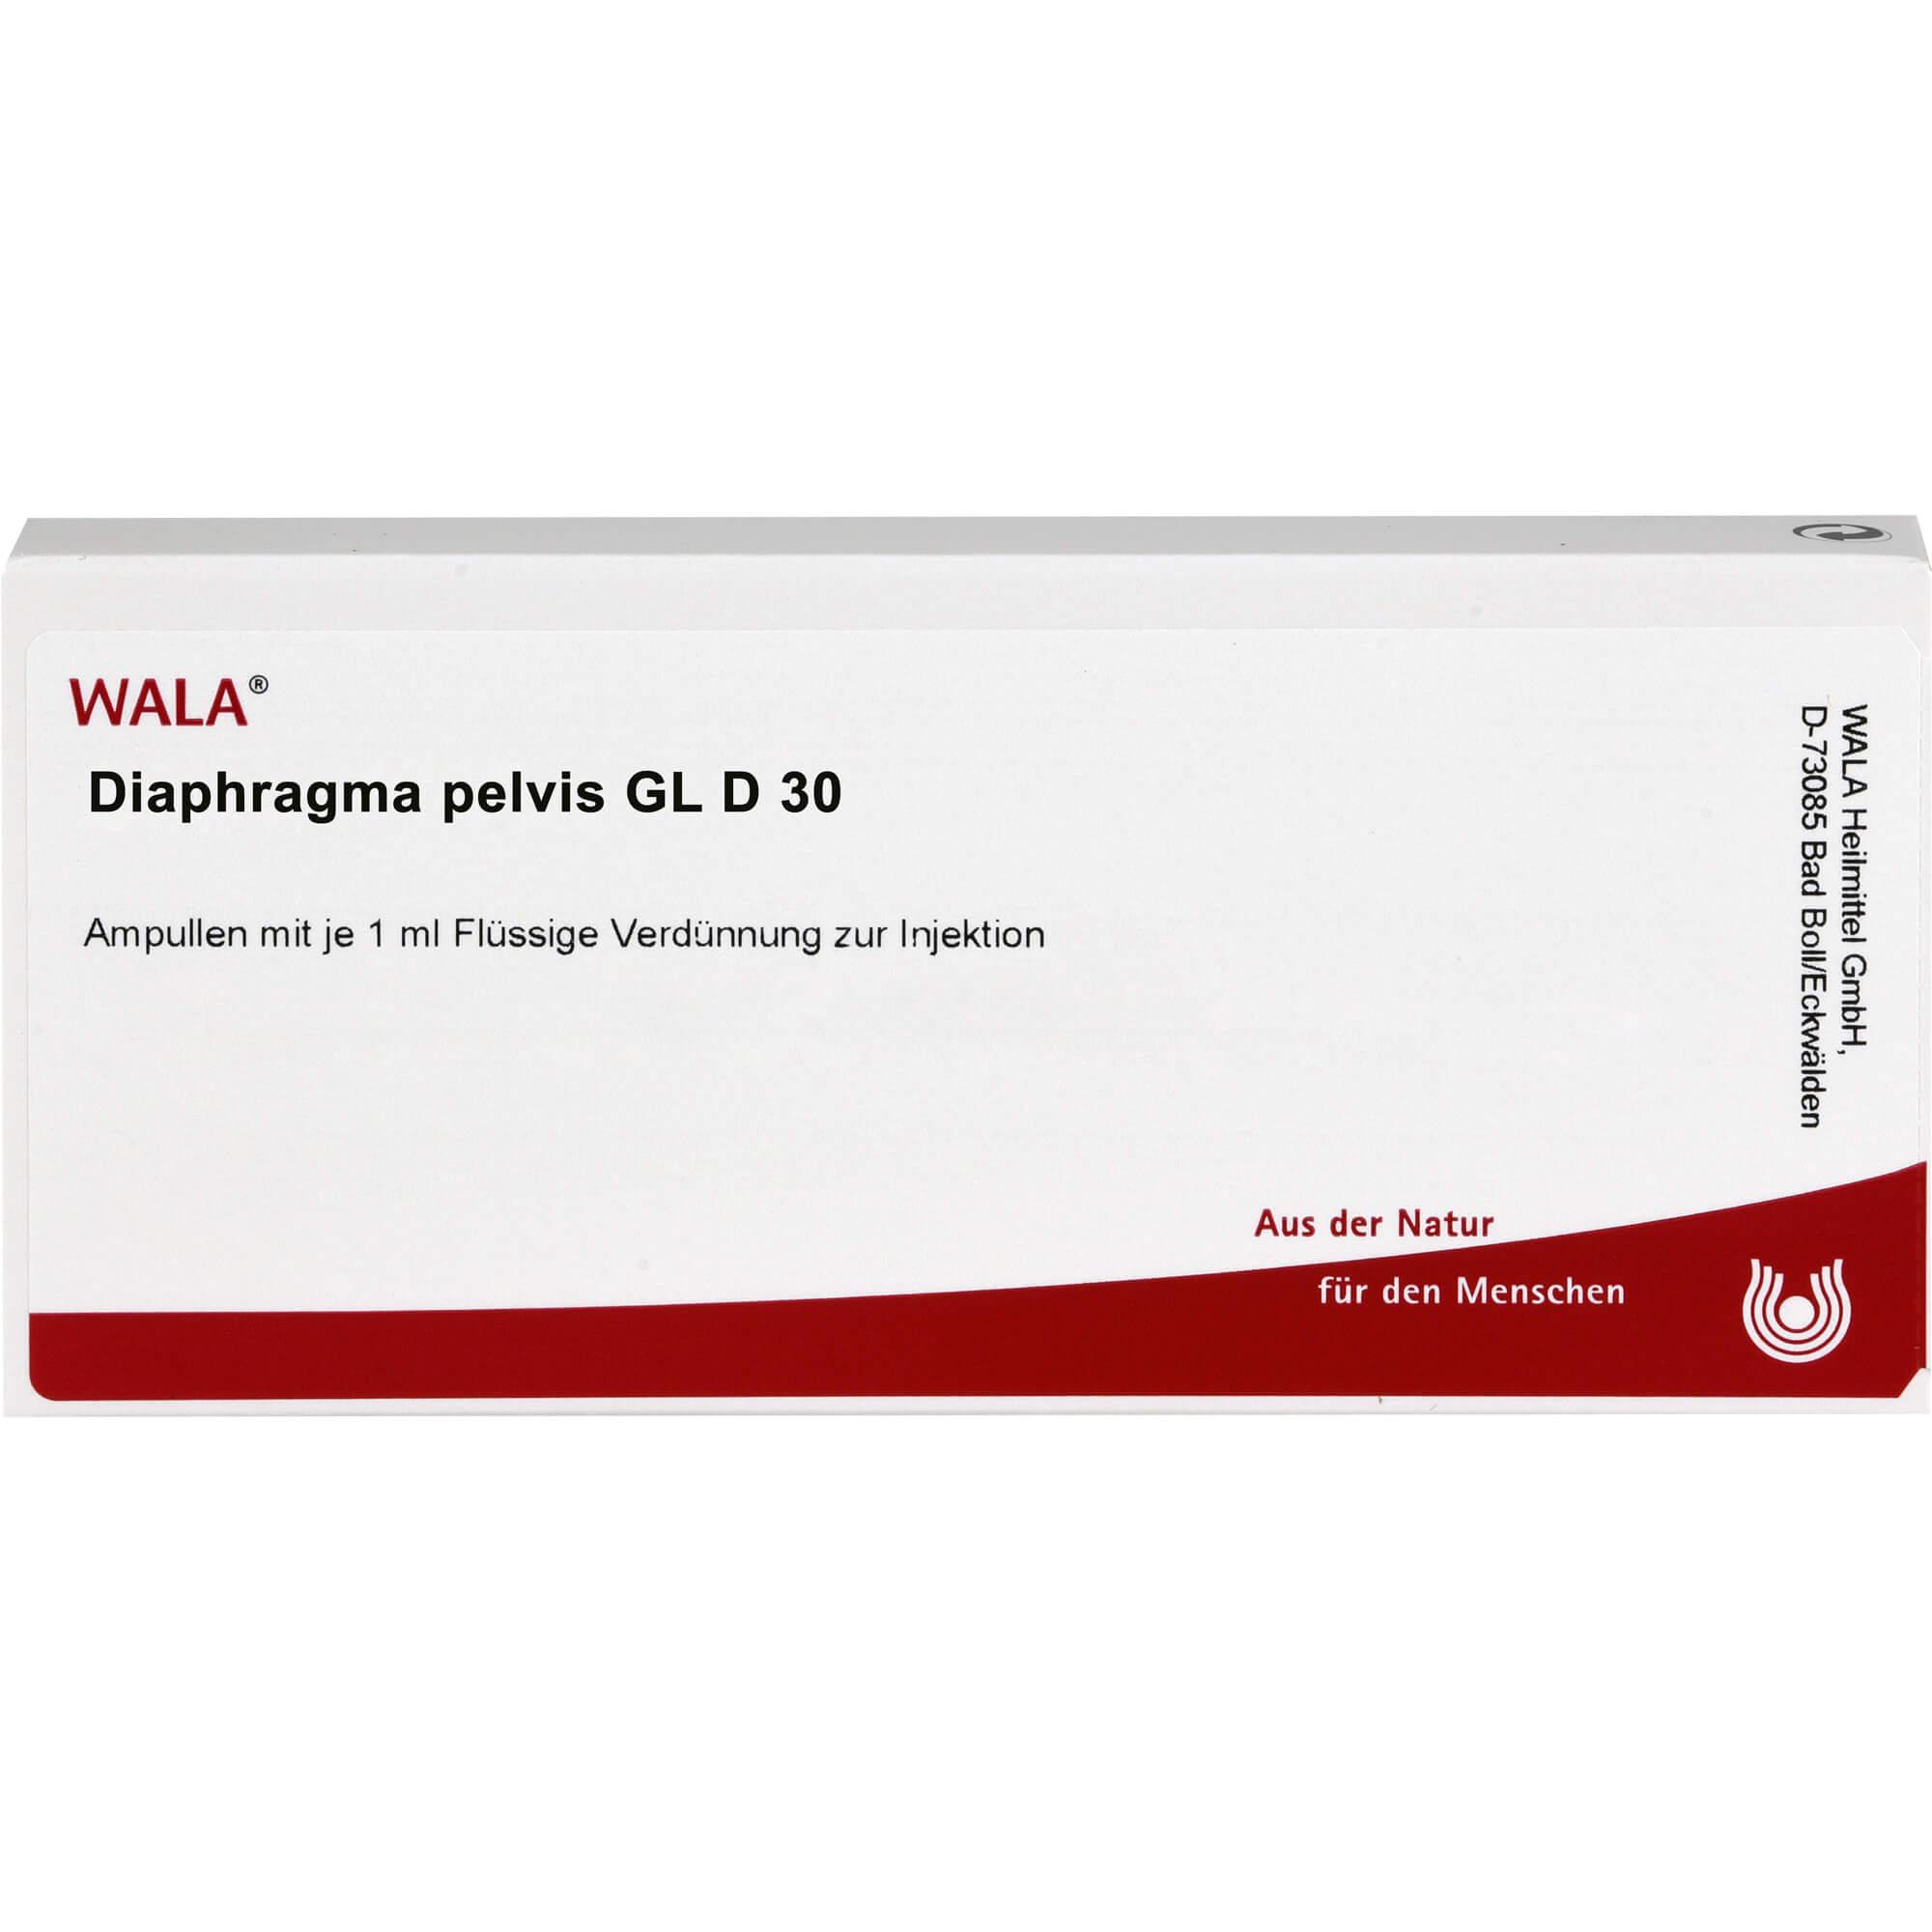 DIAPHRAGMA PELVIS GL D 30 Ampullen